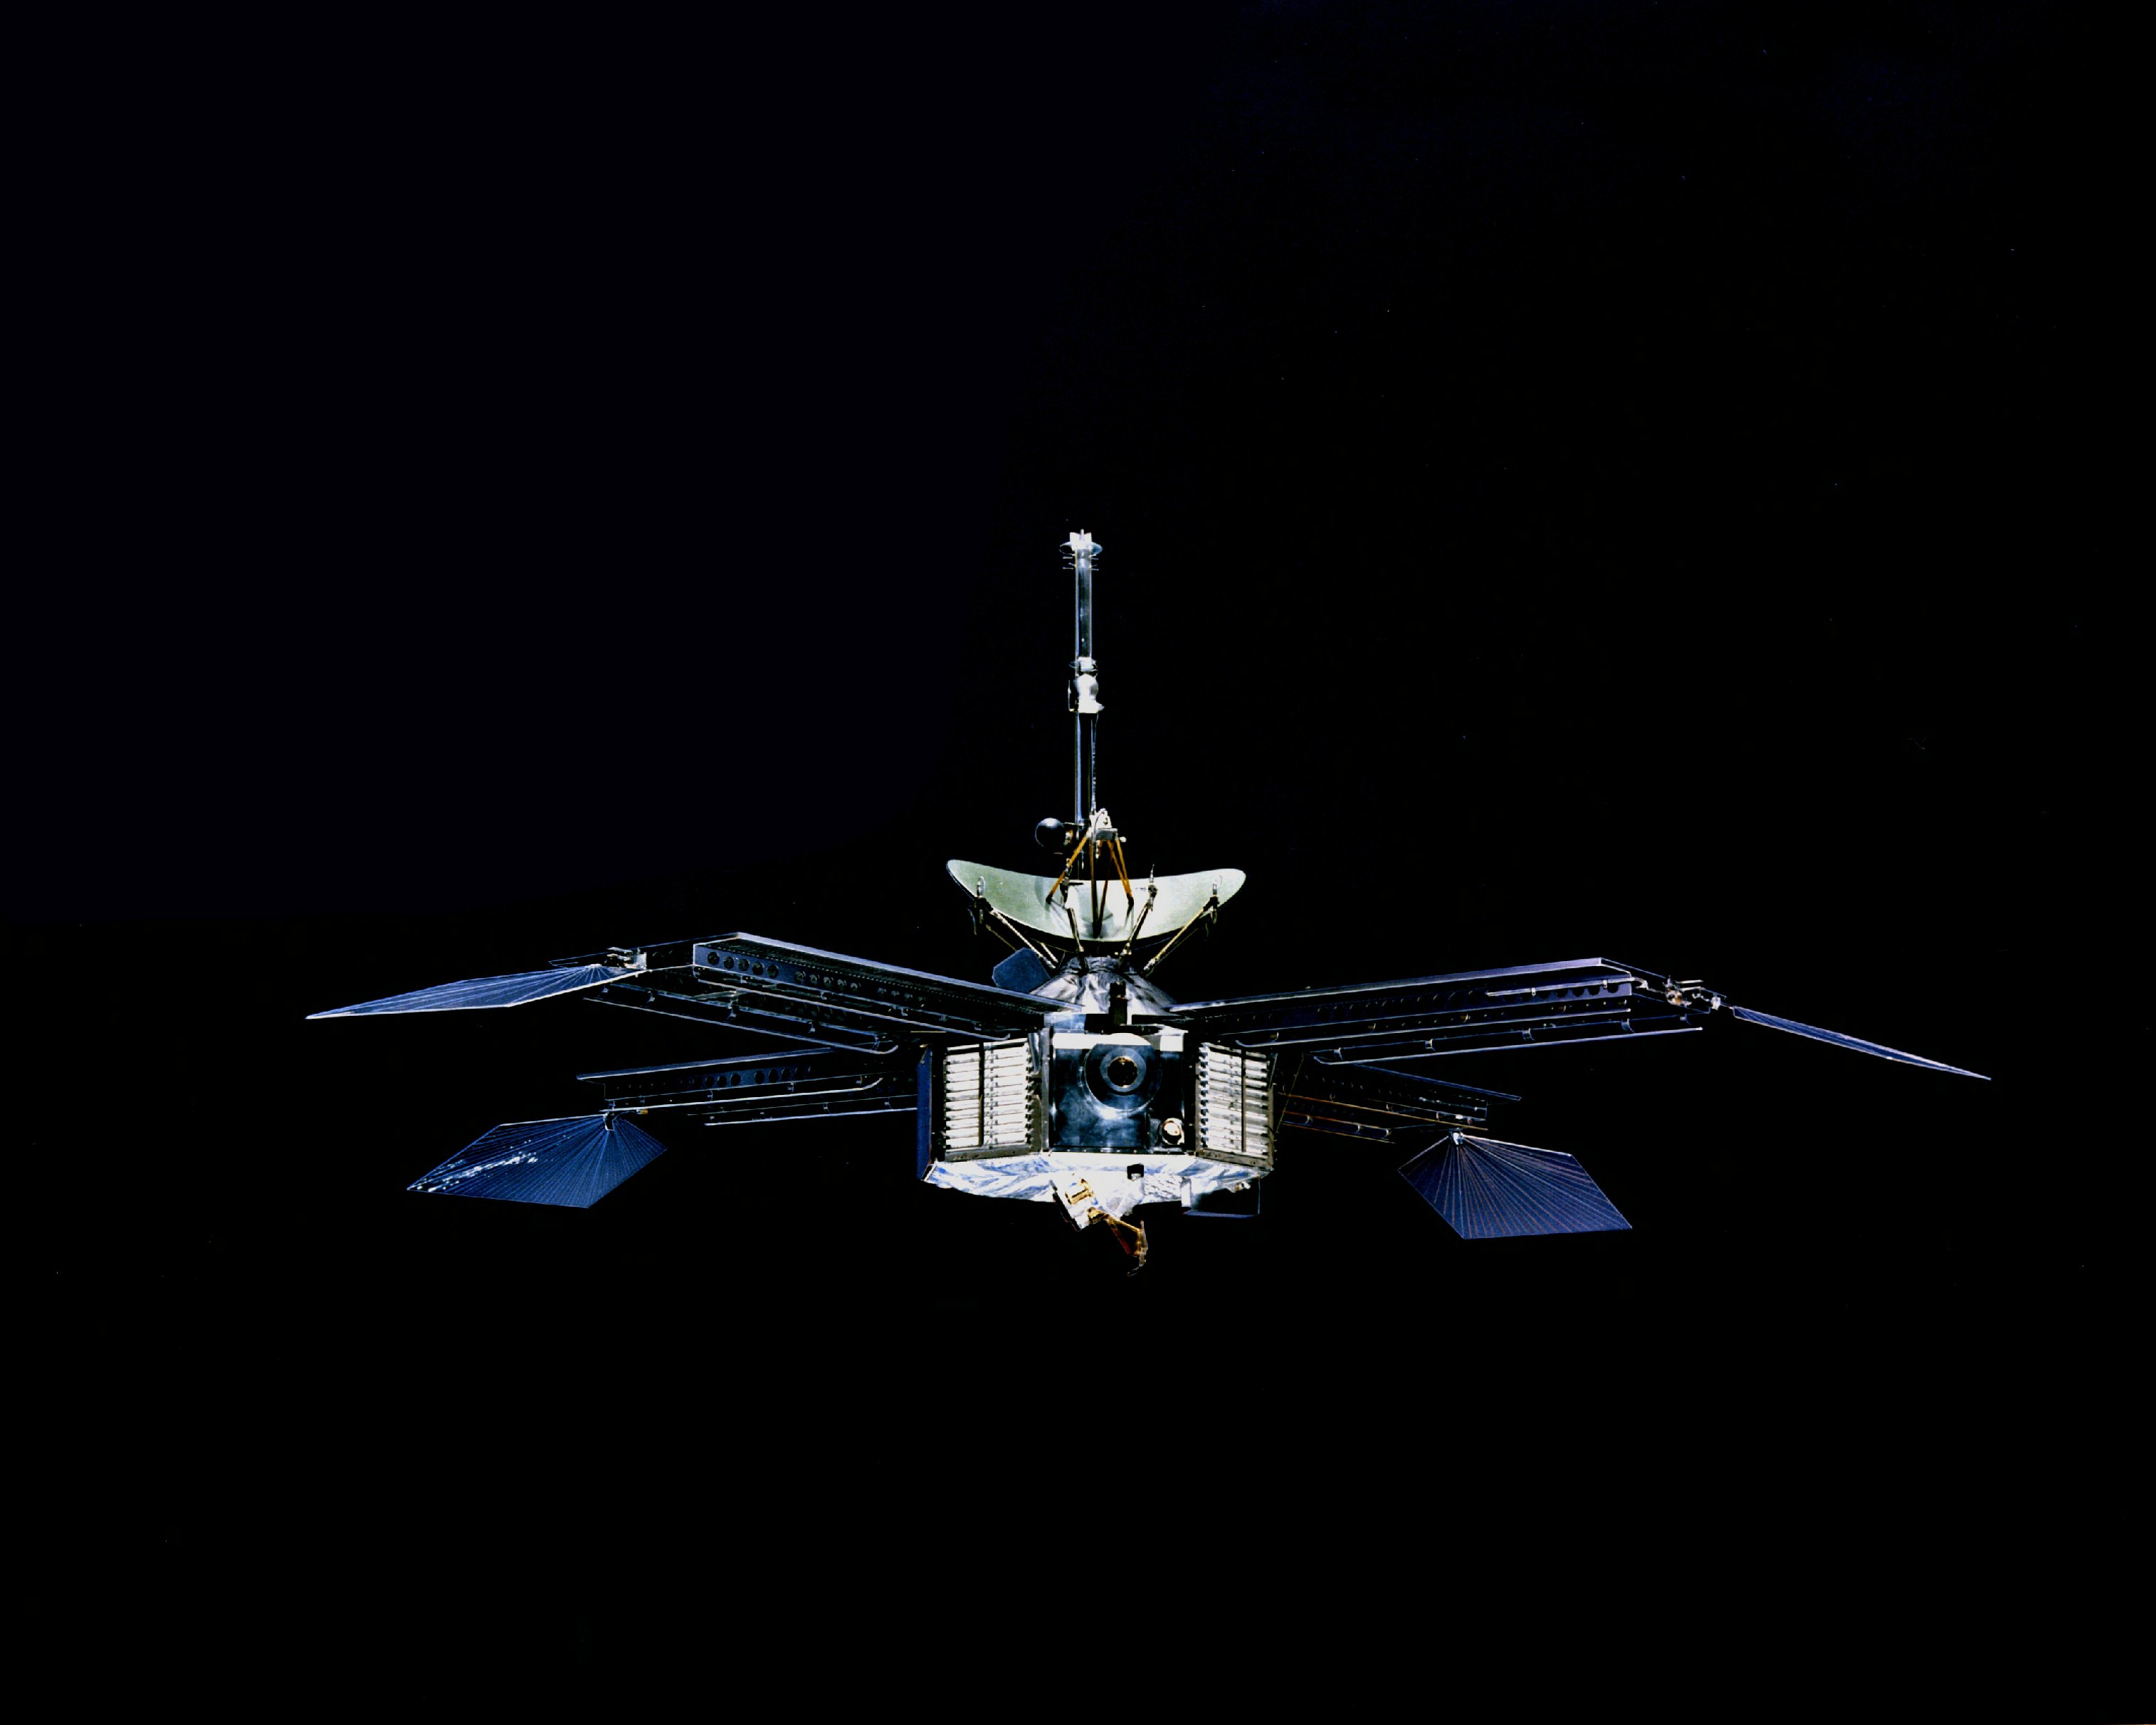 mariner 10 space probe - HD3029×2423